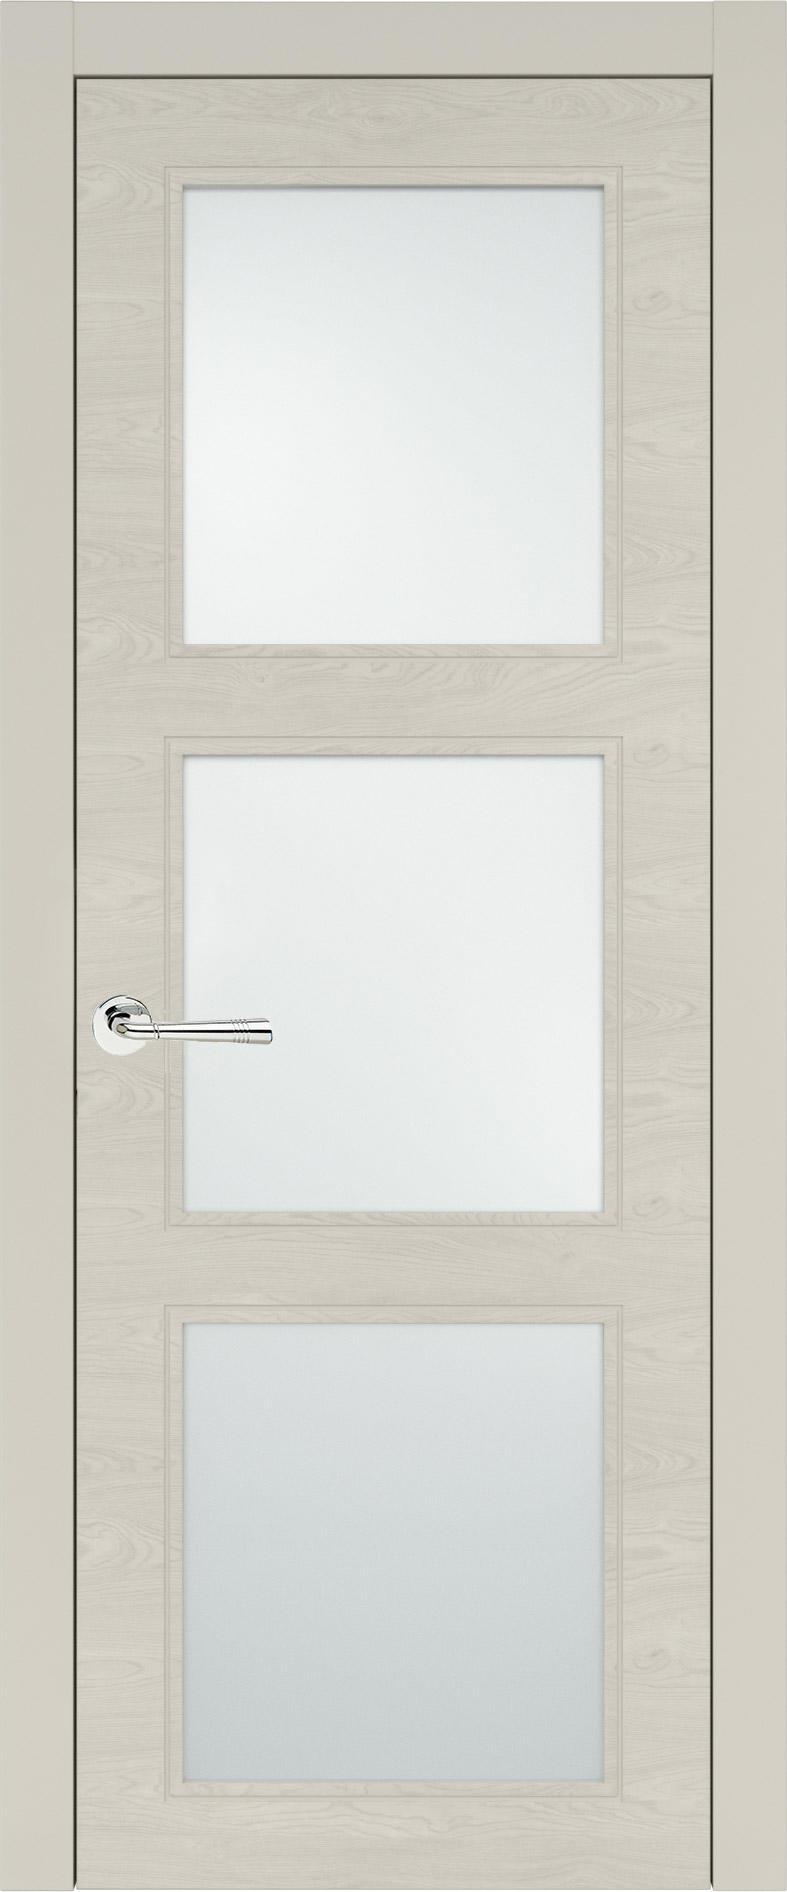 Milano Neo Classic цвет - Жемчужная эмаль по шпону (RAL 1013) Со стеклом (ДО)